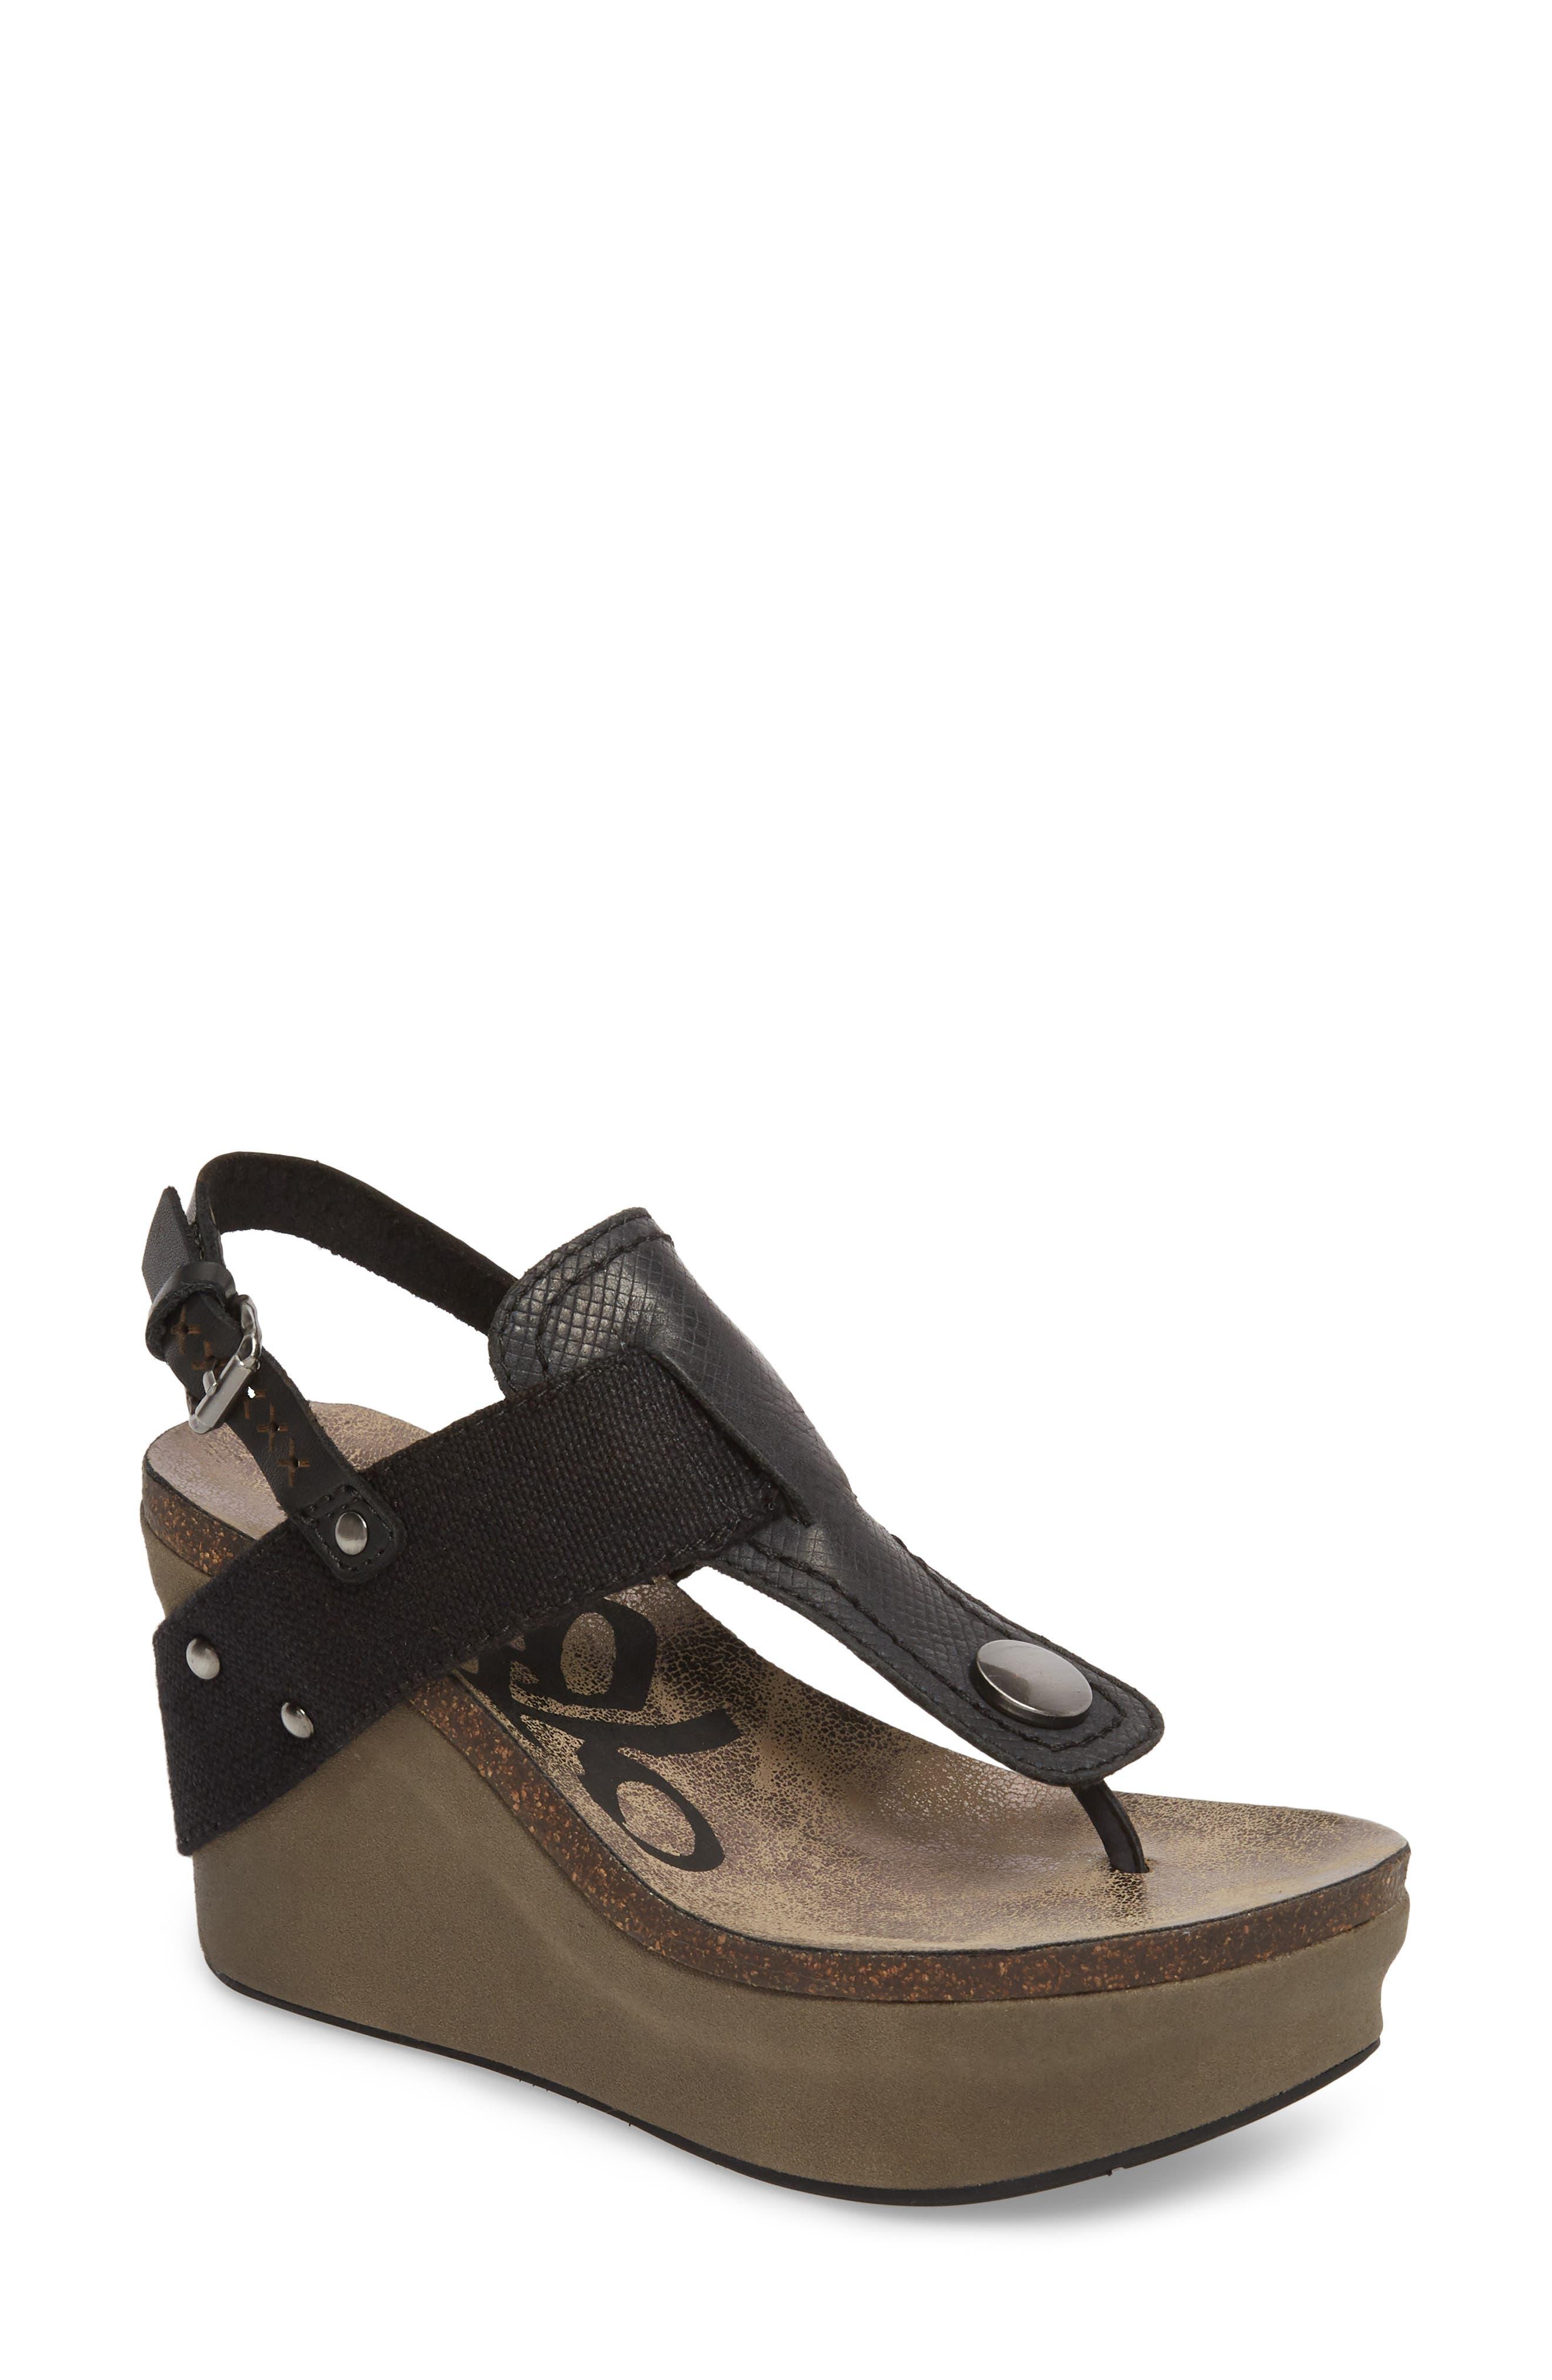 Joyride Wedge Sandal,                         Main,                         color, 001